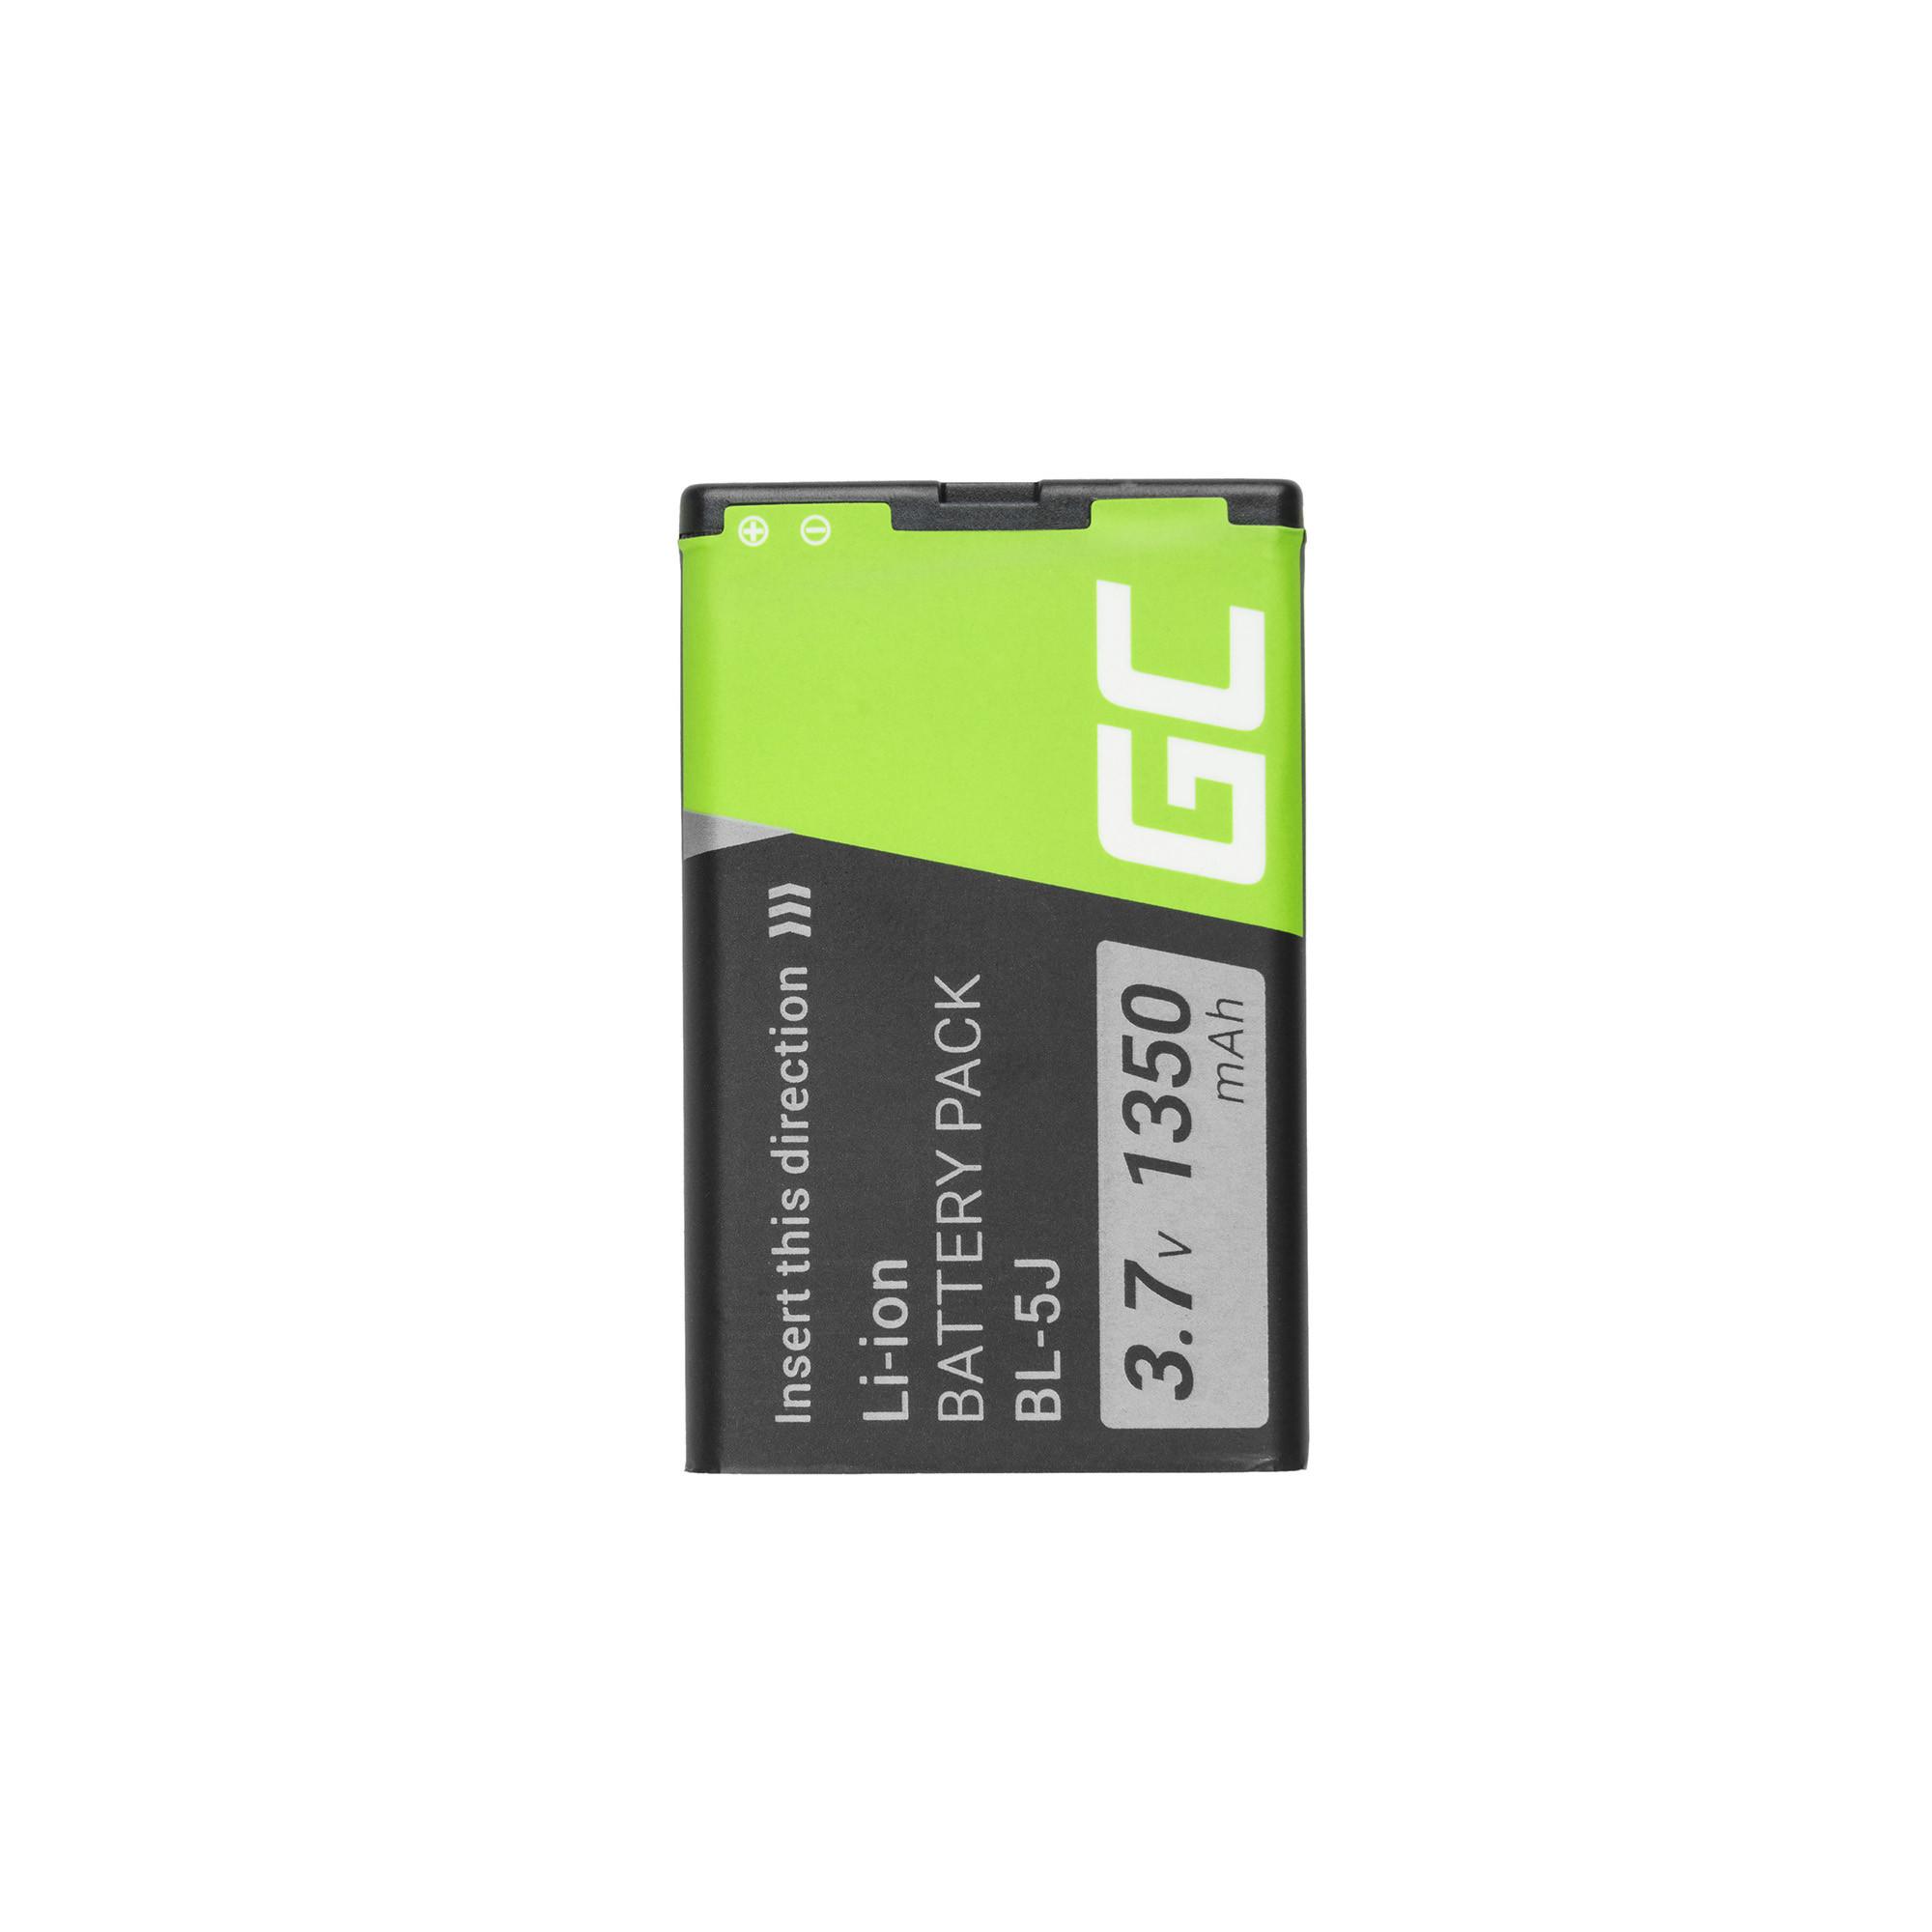 Baterie Green Cell Nokia BL-5J,BL5J Nokia Lumia, Asha 1250mAh Li-ion - neoriginální